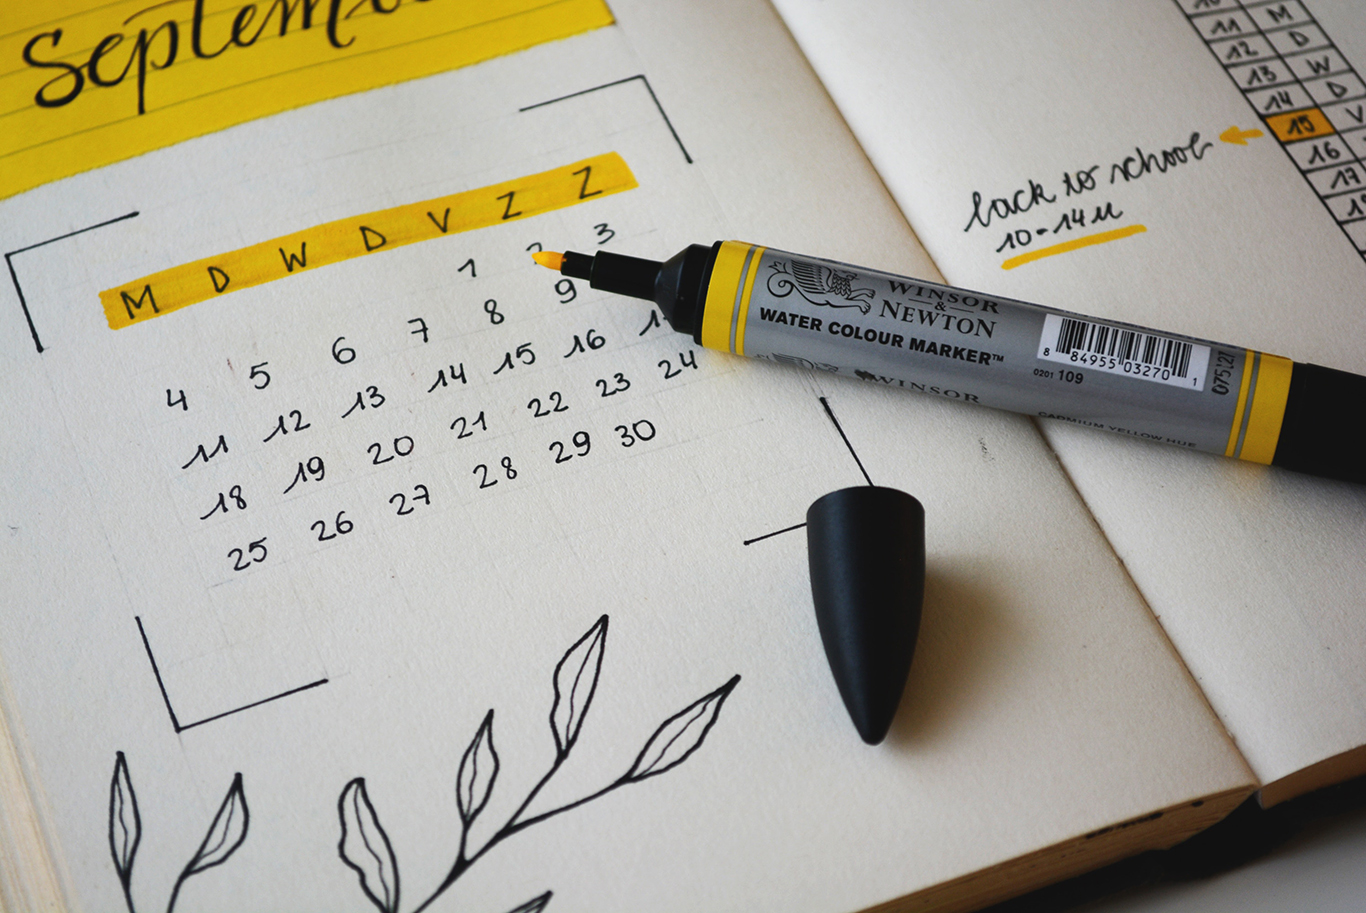 Acing the SAT: Set a schedule